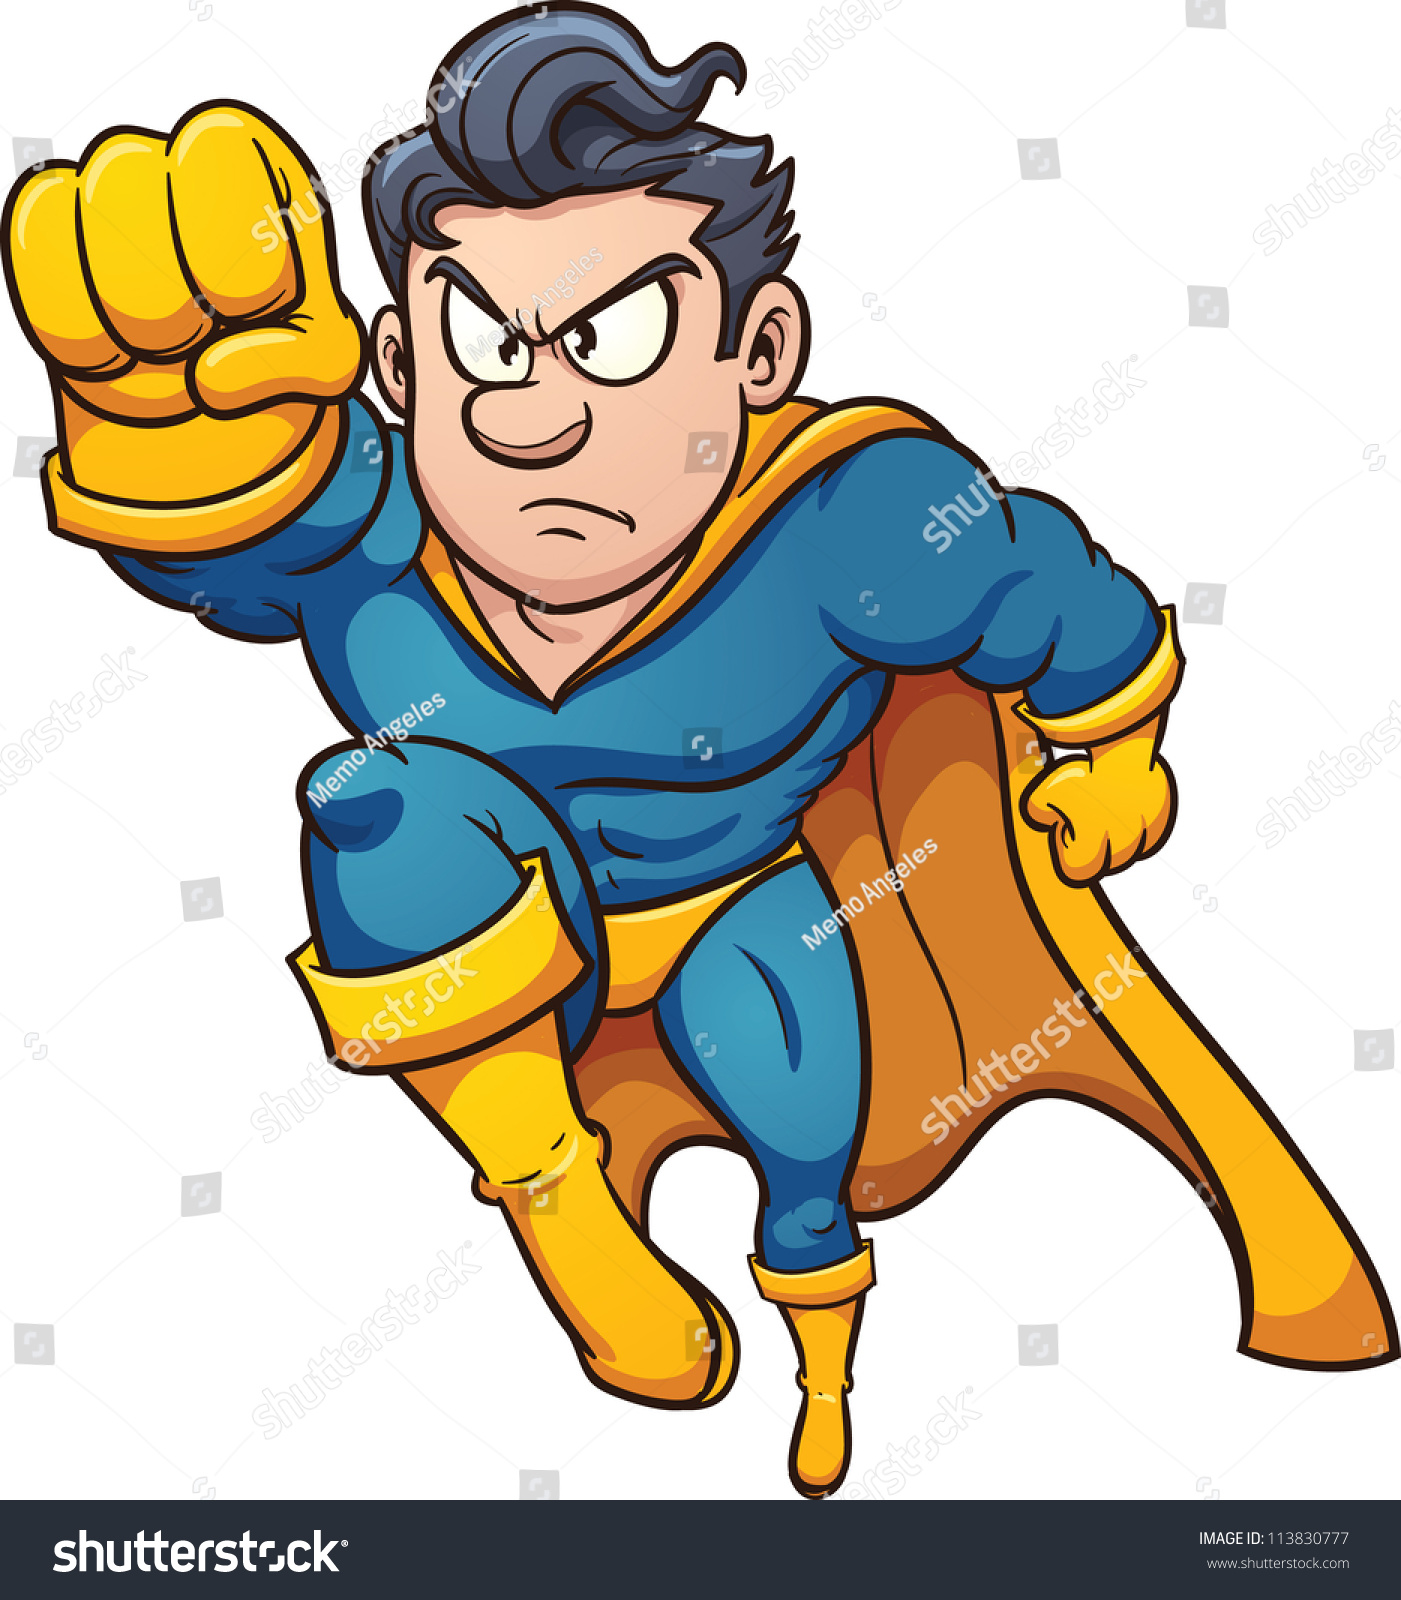 stock-vector-cartoon-flying-superhero-vector-illustration-with-simple ... Superhero Flying Vector